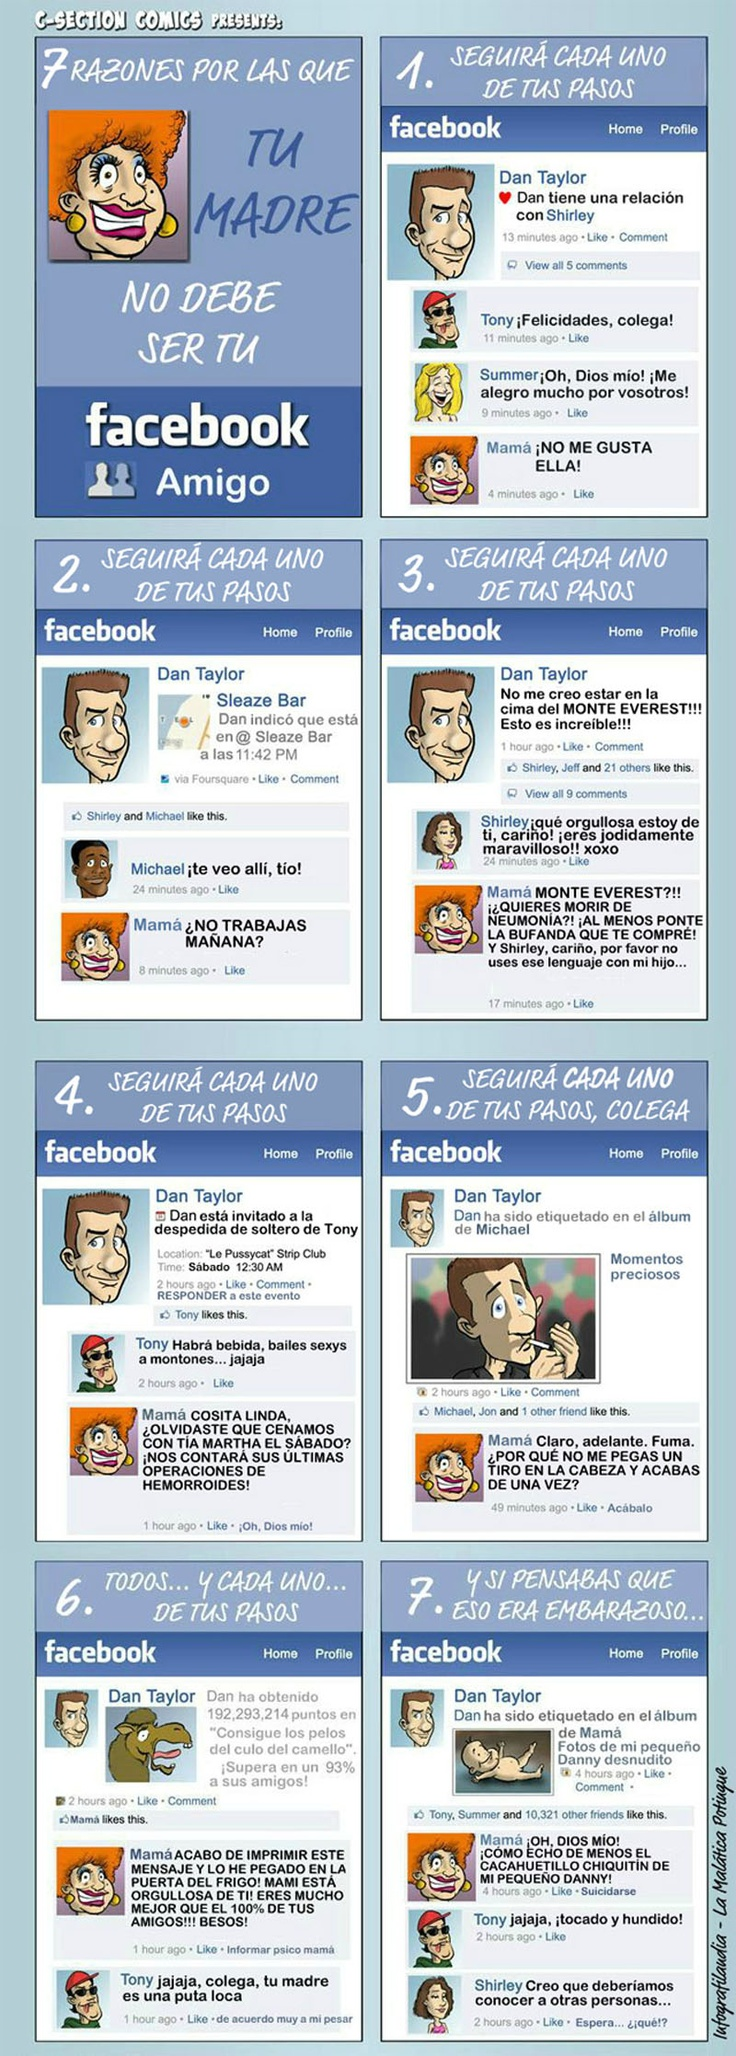 B1/C2 - ¿Aceptarías a tu madre (o a tu padre) en Facebook?